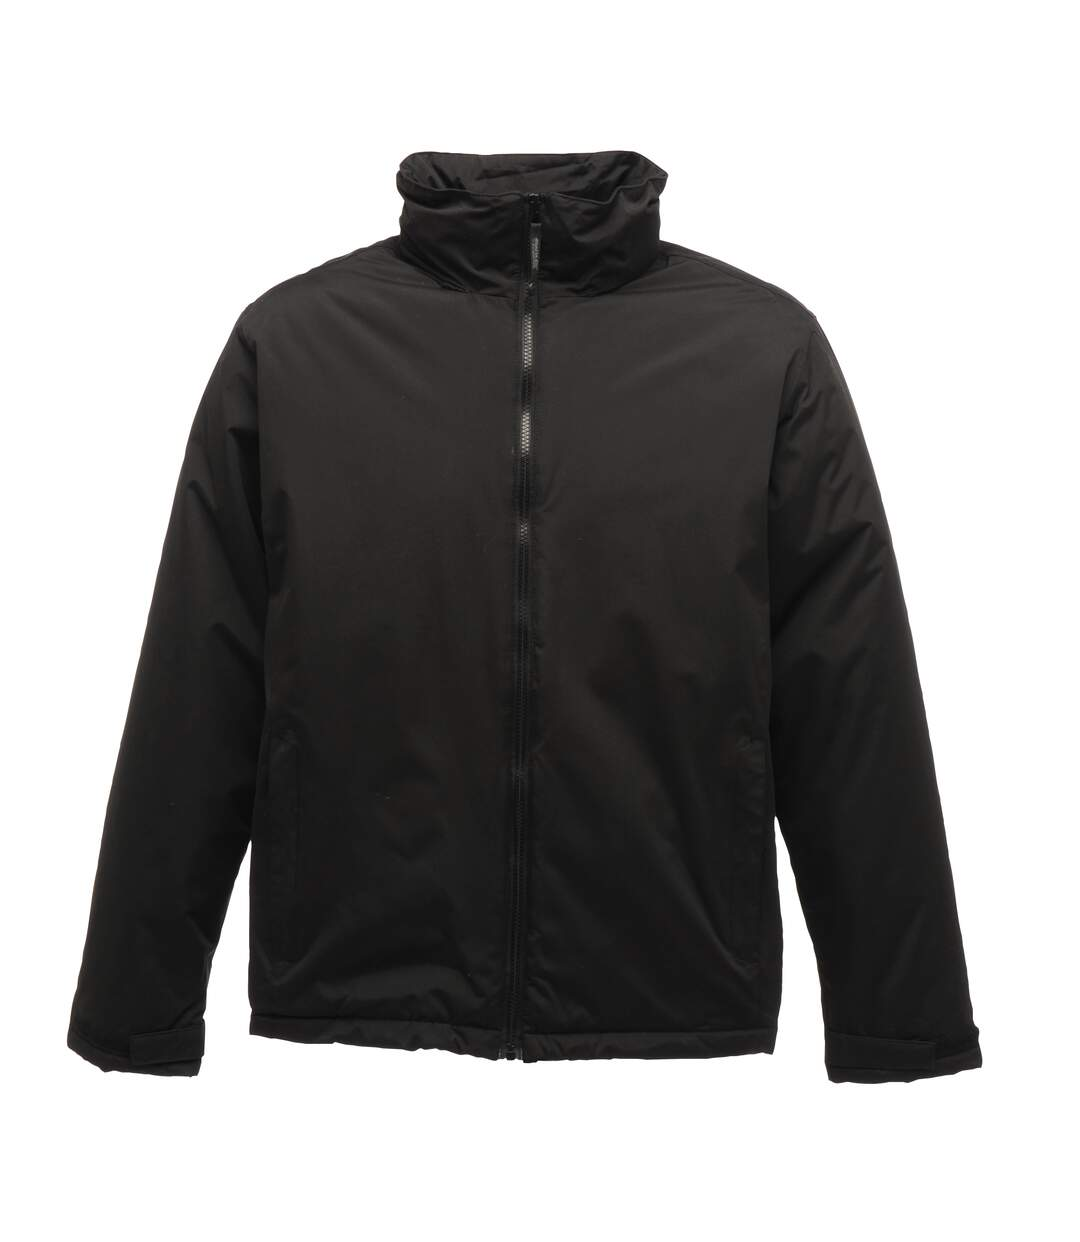 Regatta Professional Mens Classic Shell Waterproof Jacket (Black) - UTRG1915